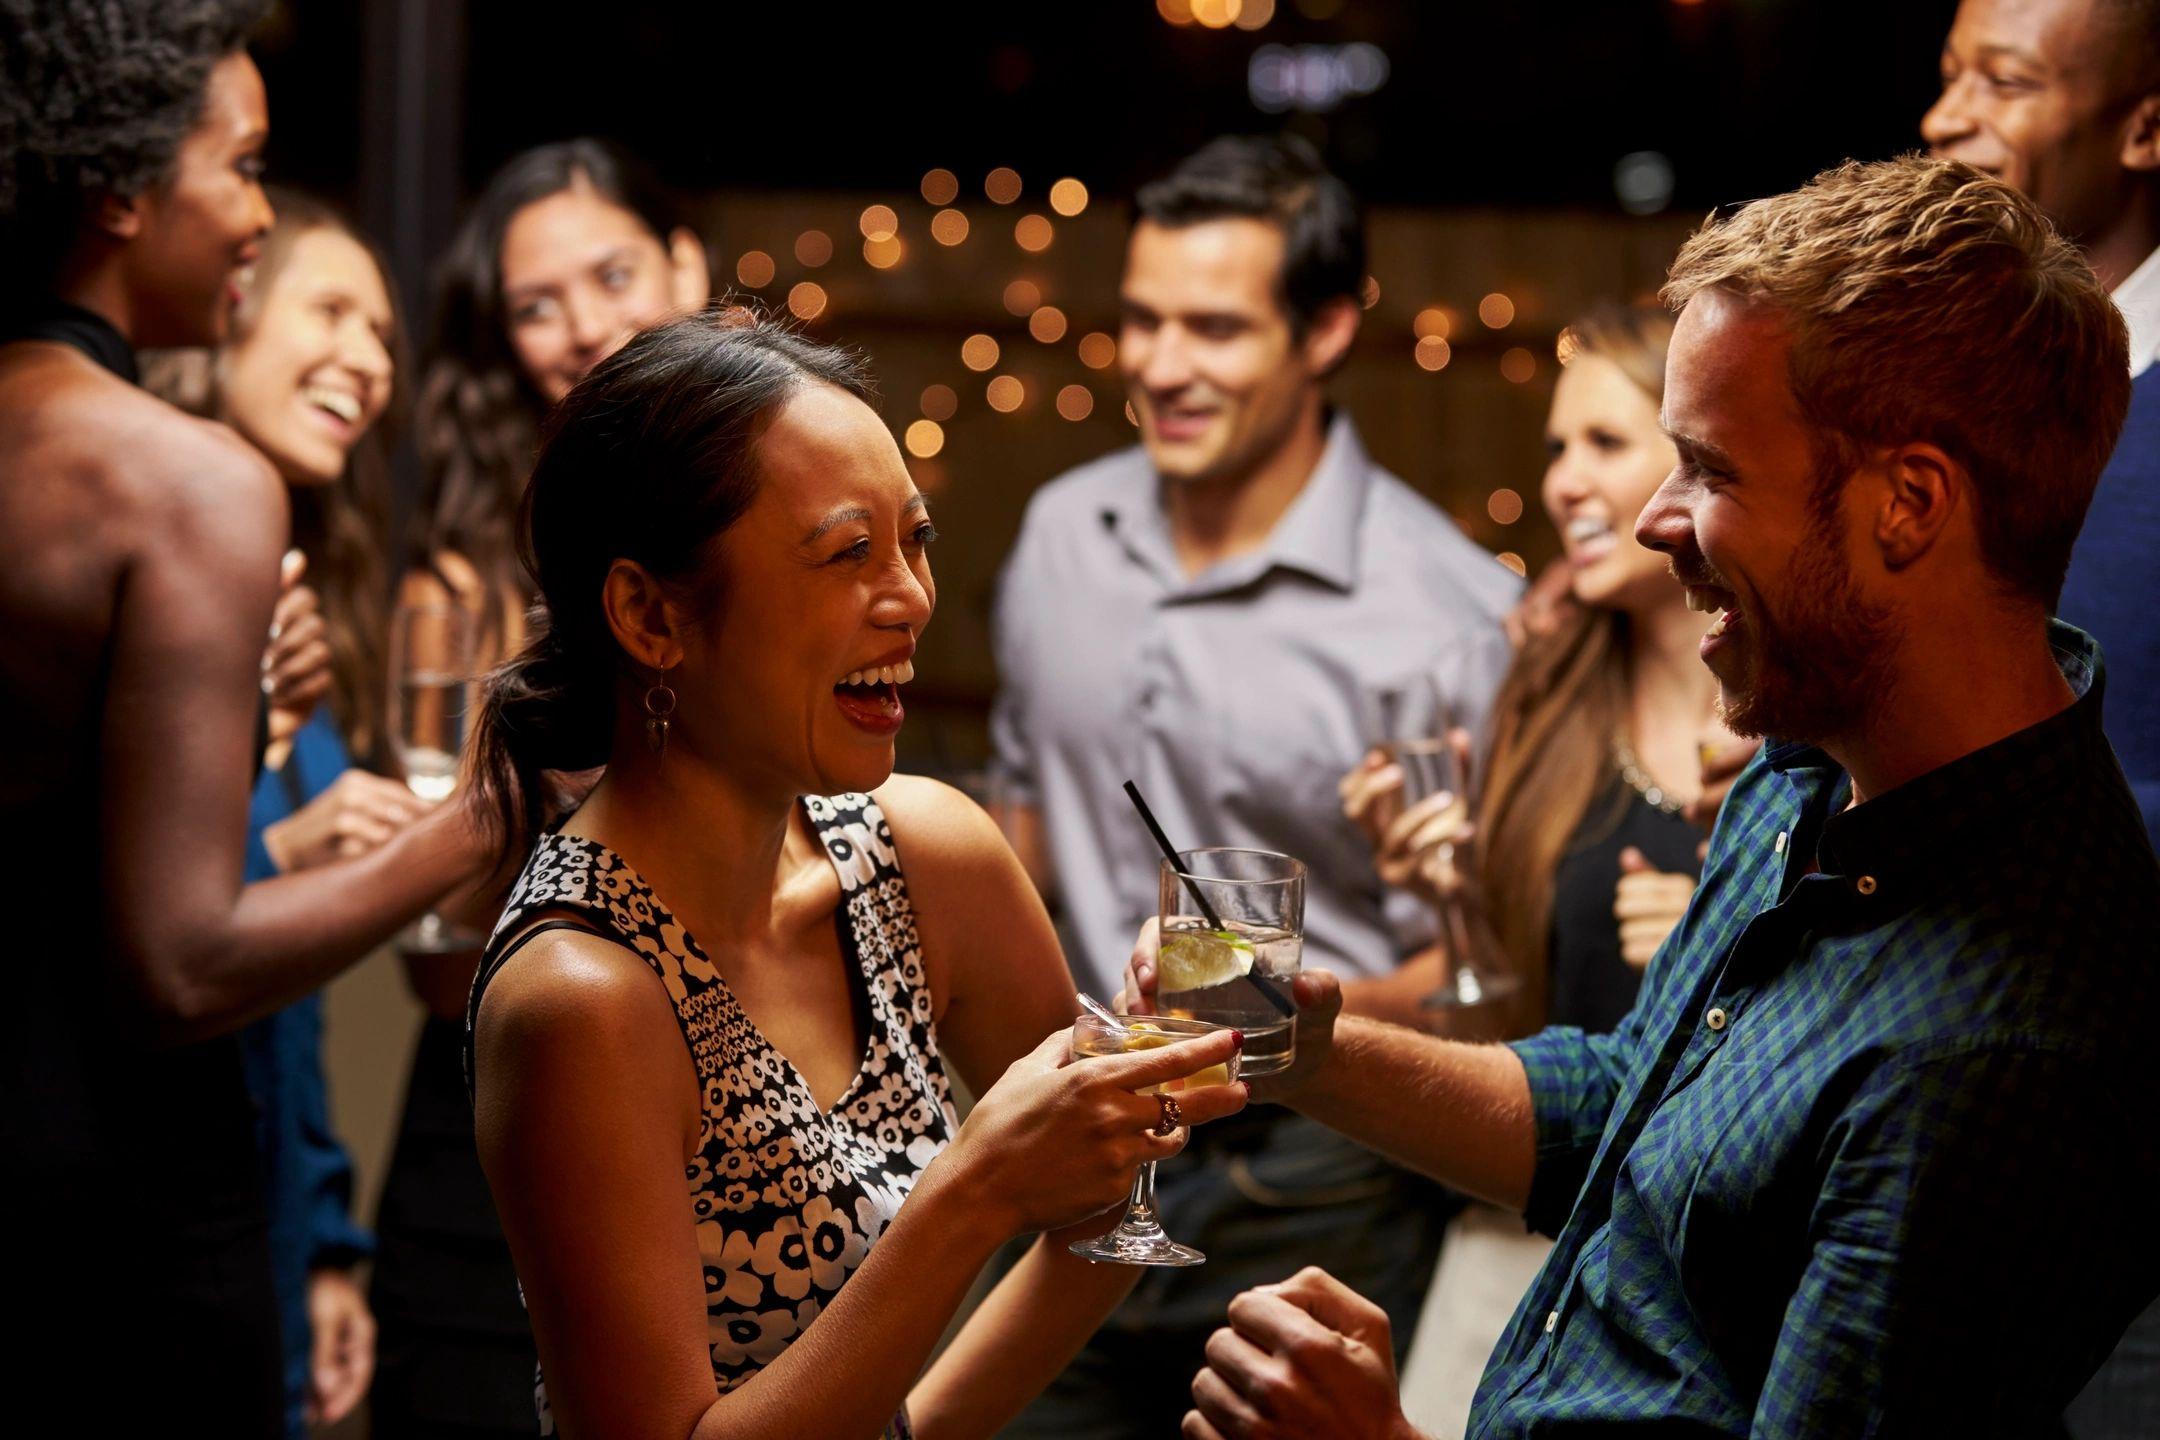 overcoming social anxiety at parties & gatherings